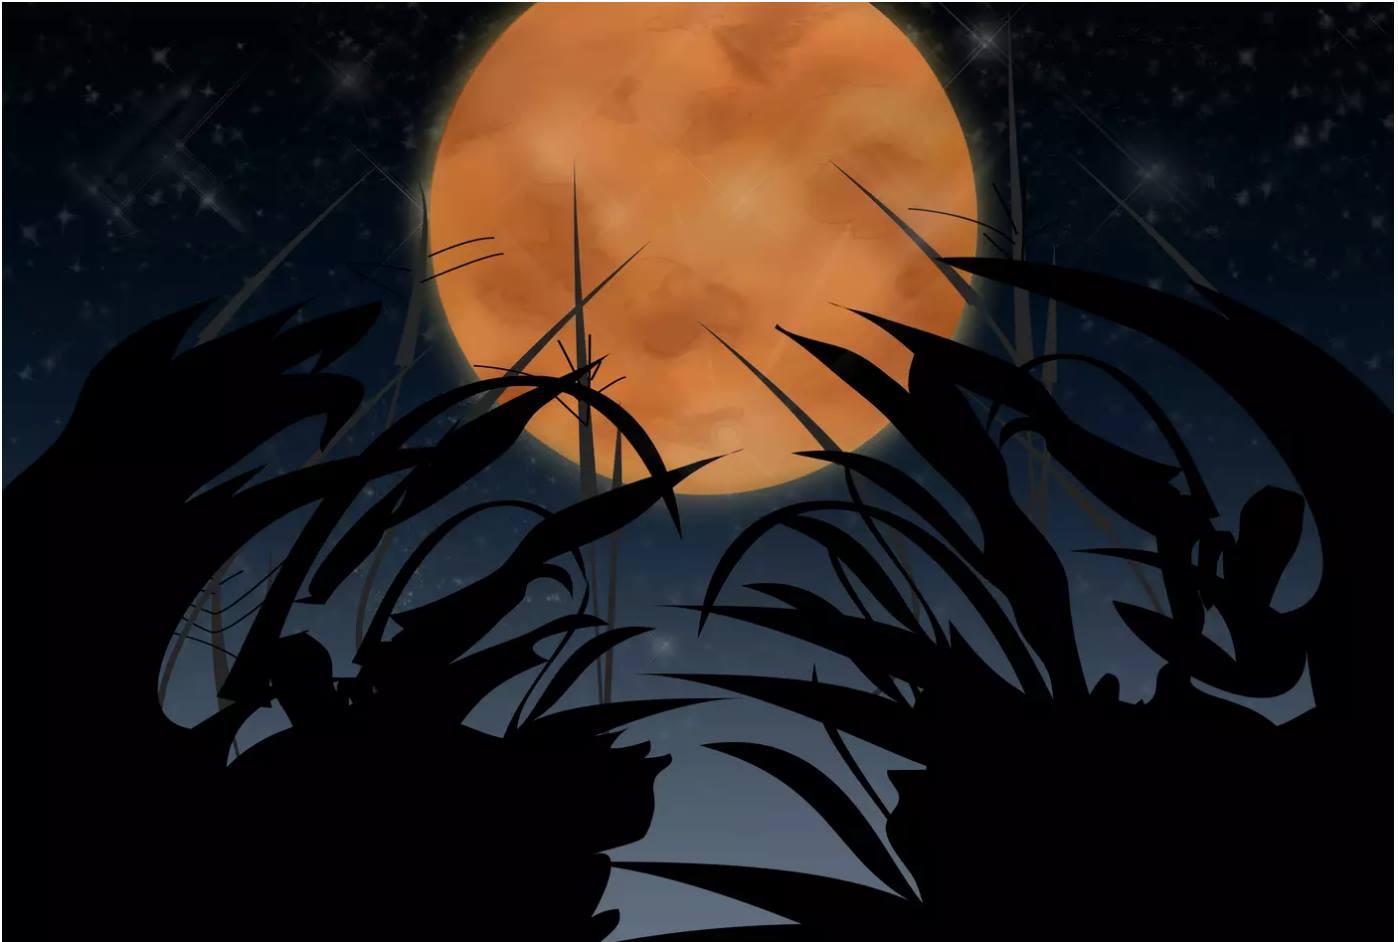 Harvest Moon in the night sky